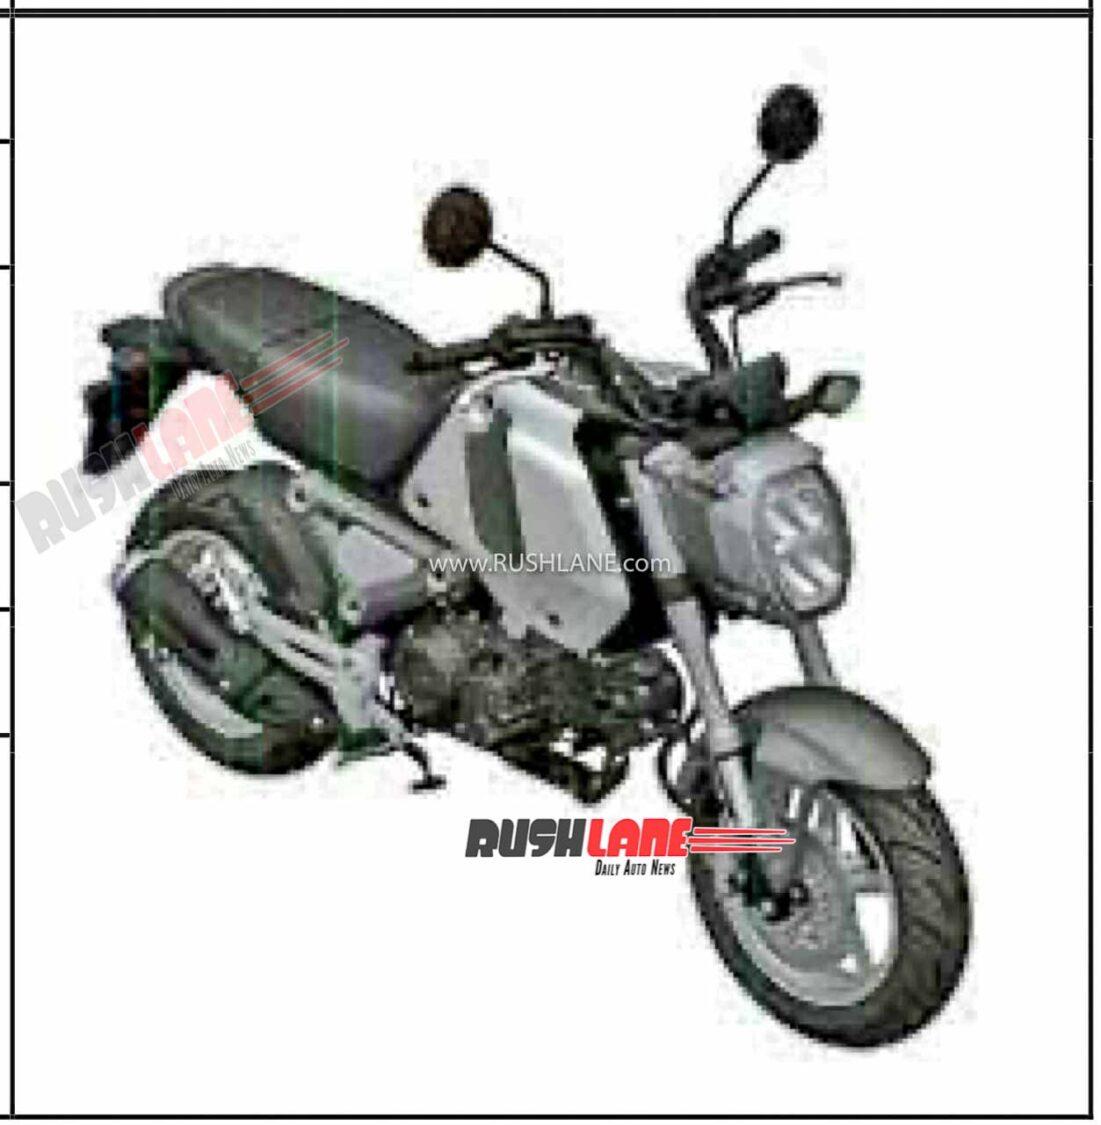 Honda Grom 125 Patented in India